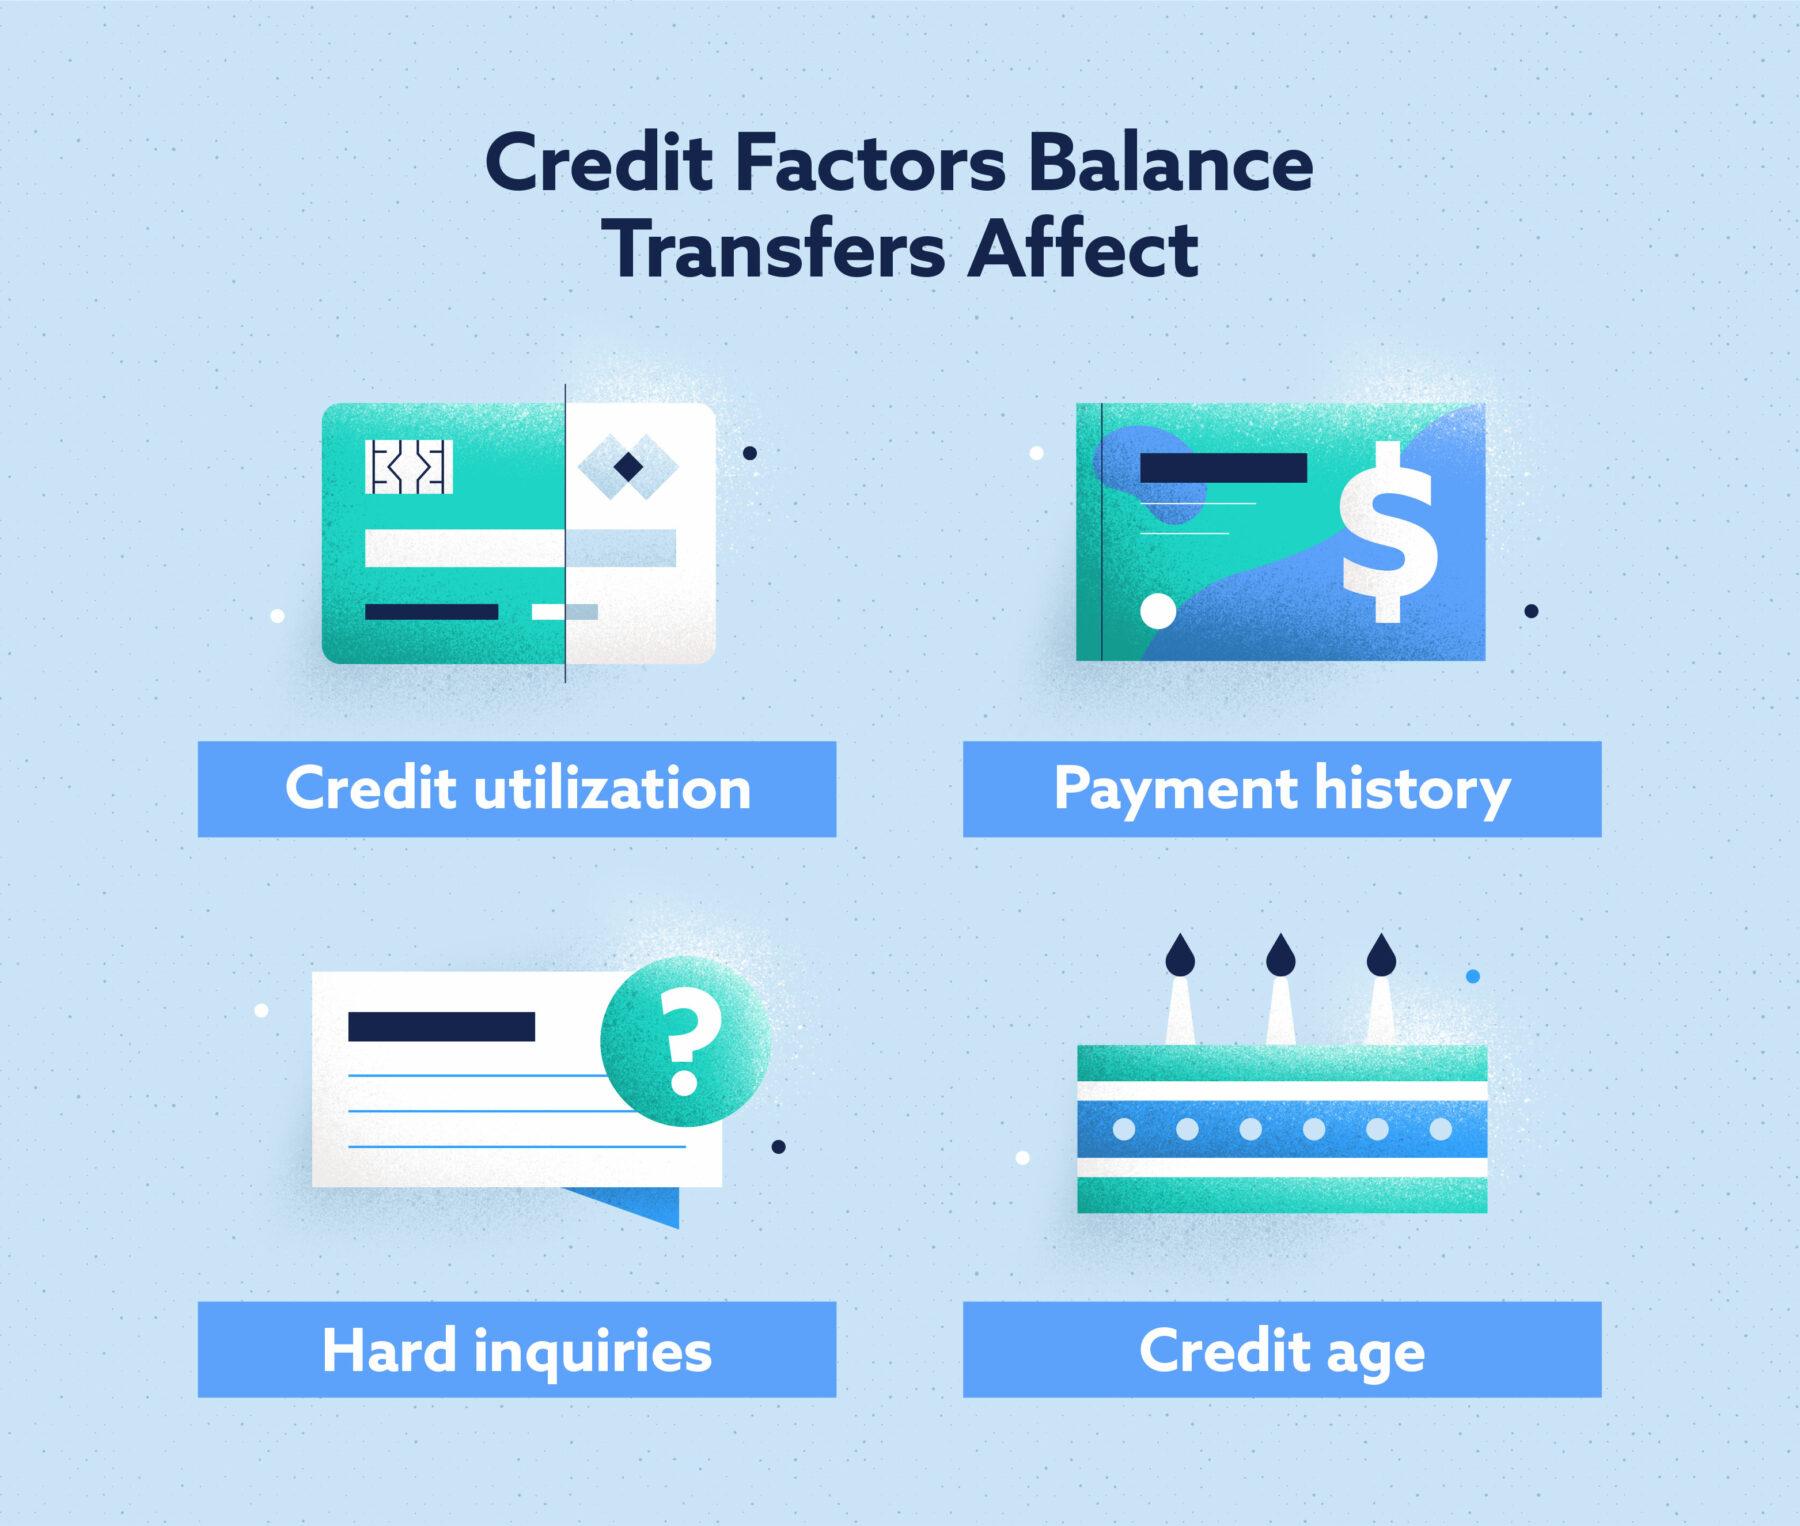 Credit Factors Balance Transfer Affect Image